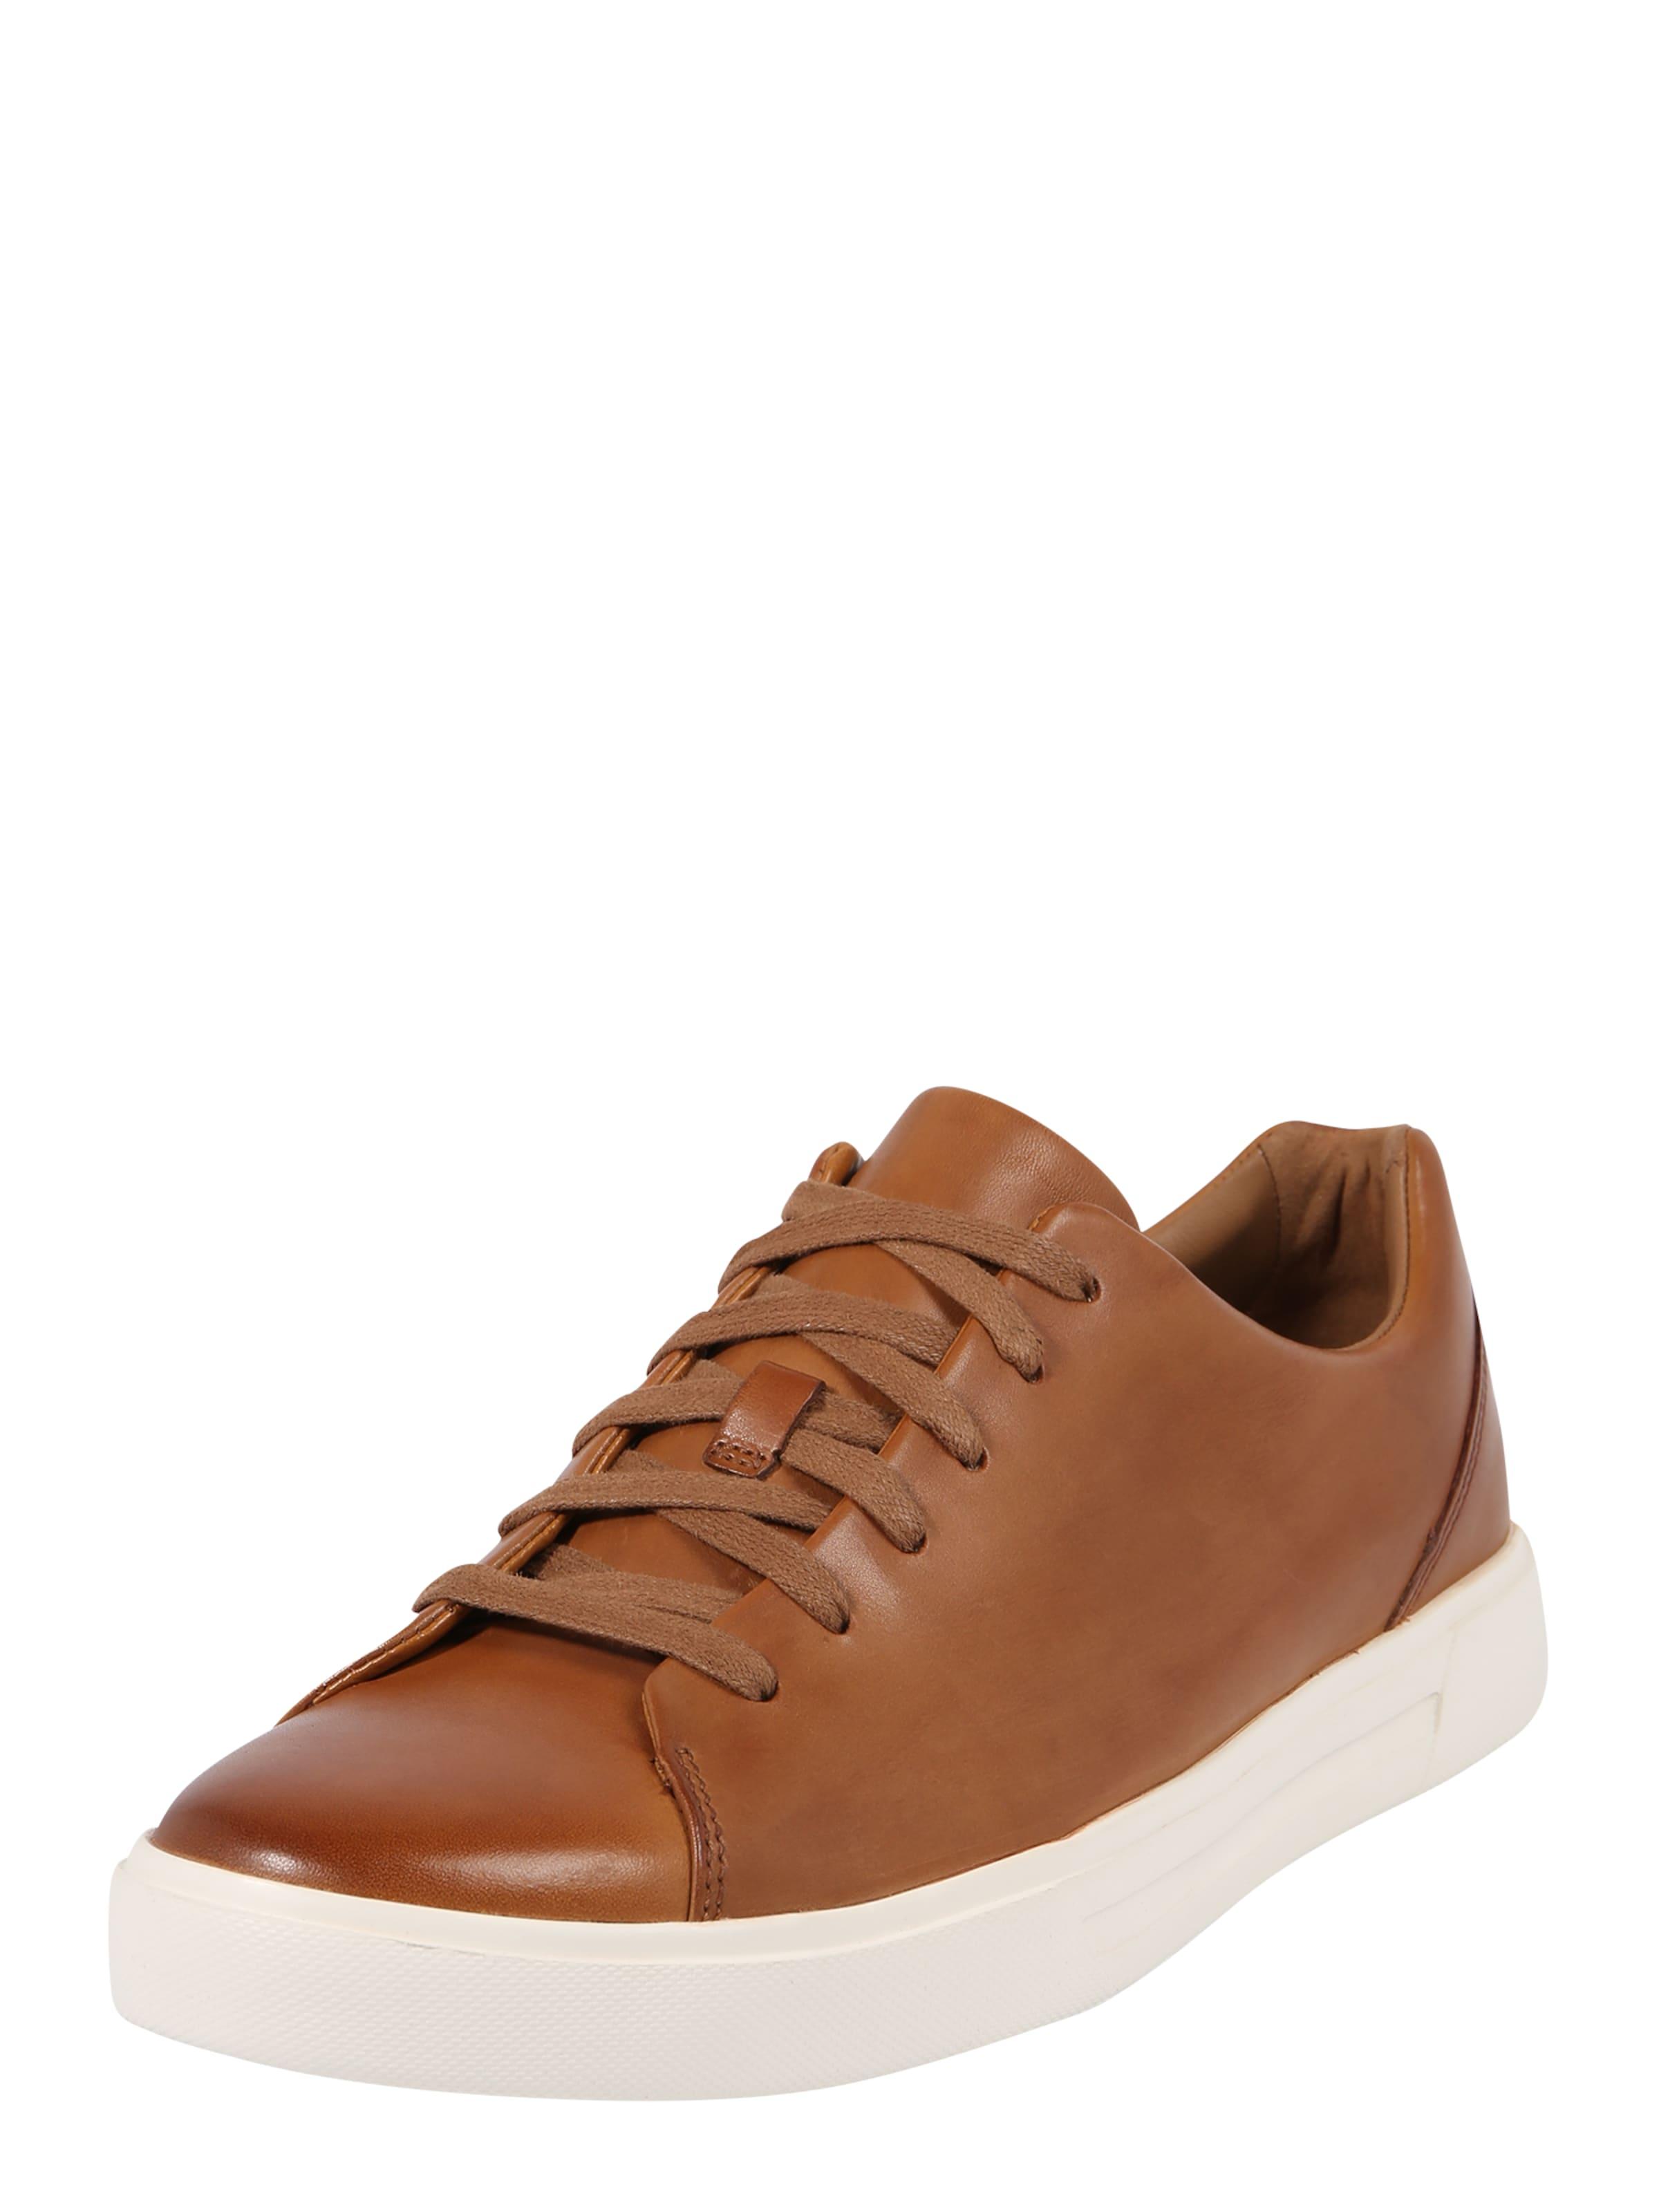 Cognac Clarks 'un Lace' Sneaker Costa In UzVjqSpLGM